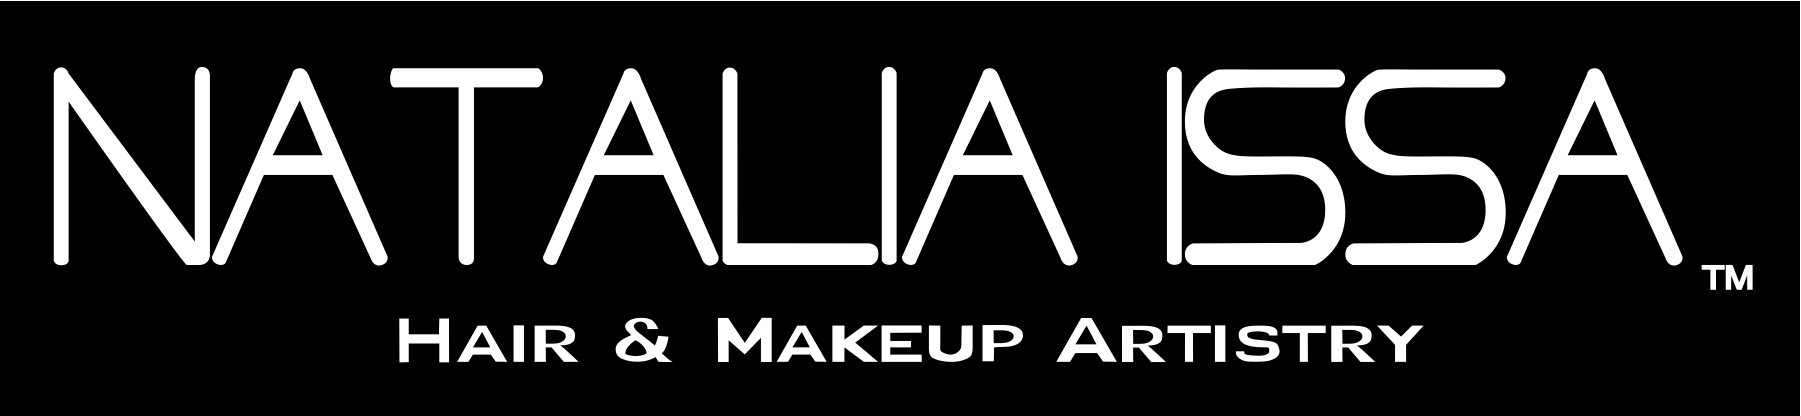 Natalia Issa Pro Hair & Makeup Artist (DFW, TX)